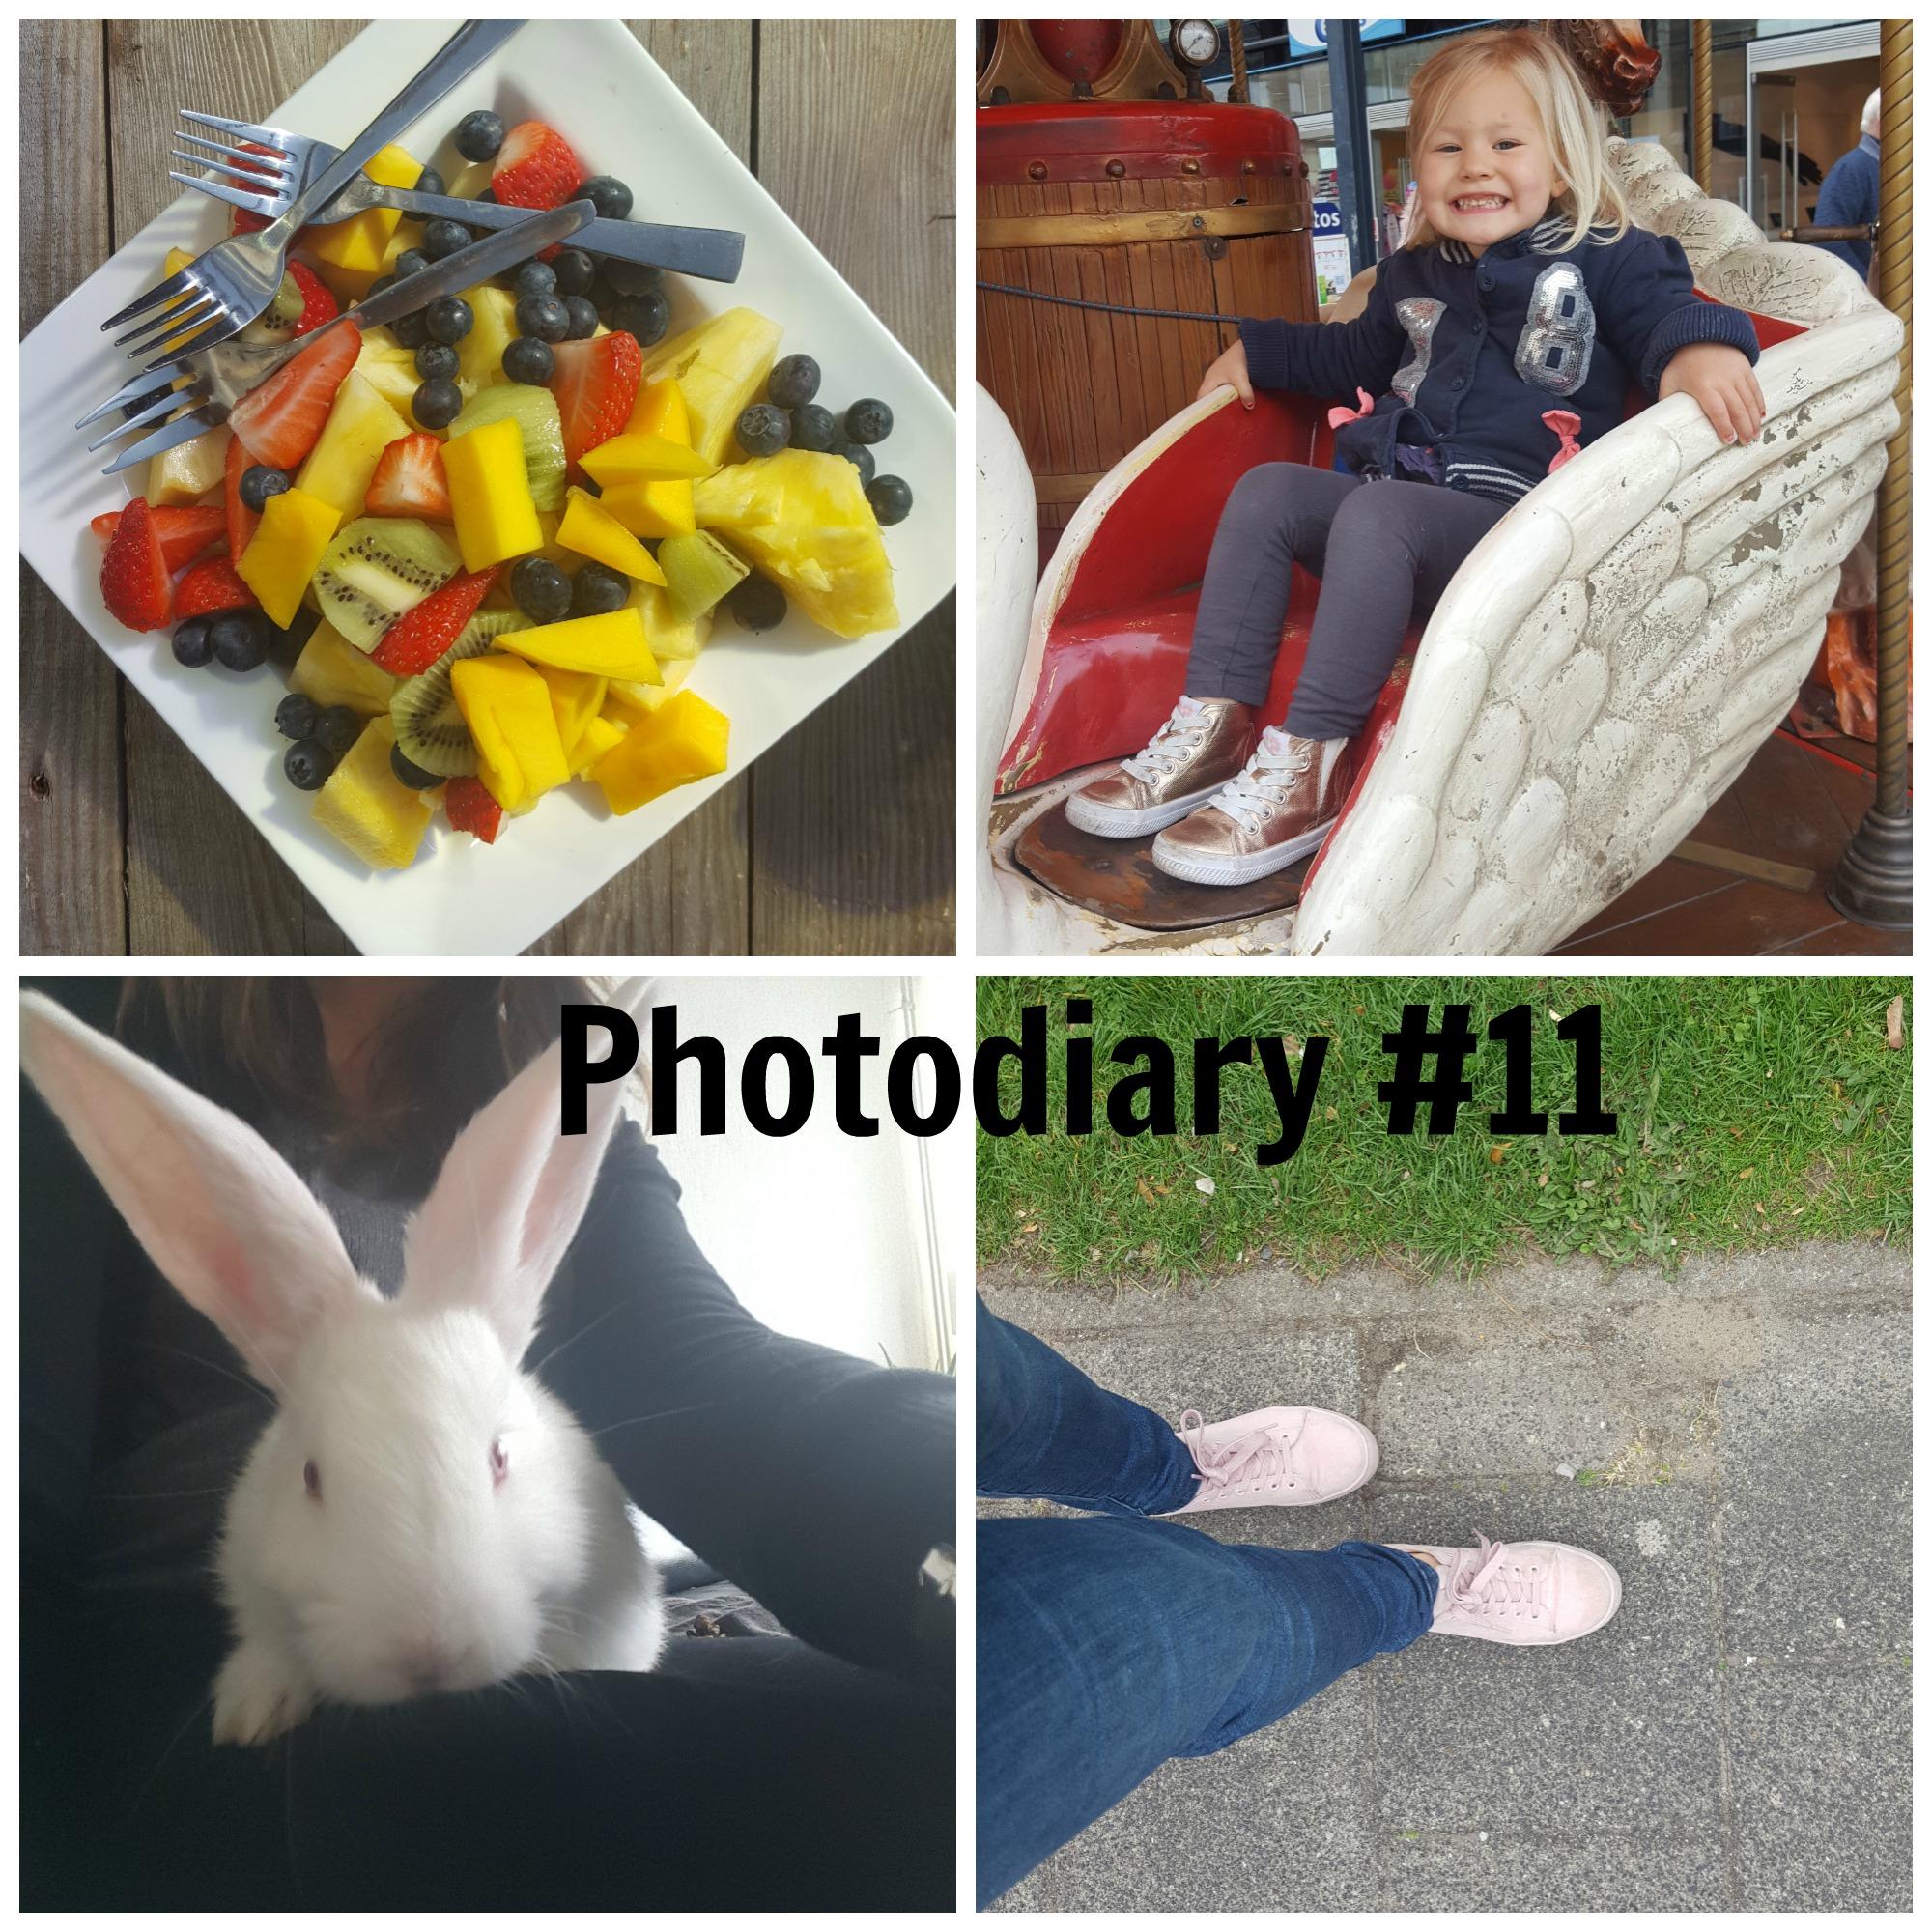 Photodiary #11 buiten spelen, kinderboerderij & meisjespannenkoeken